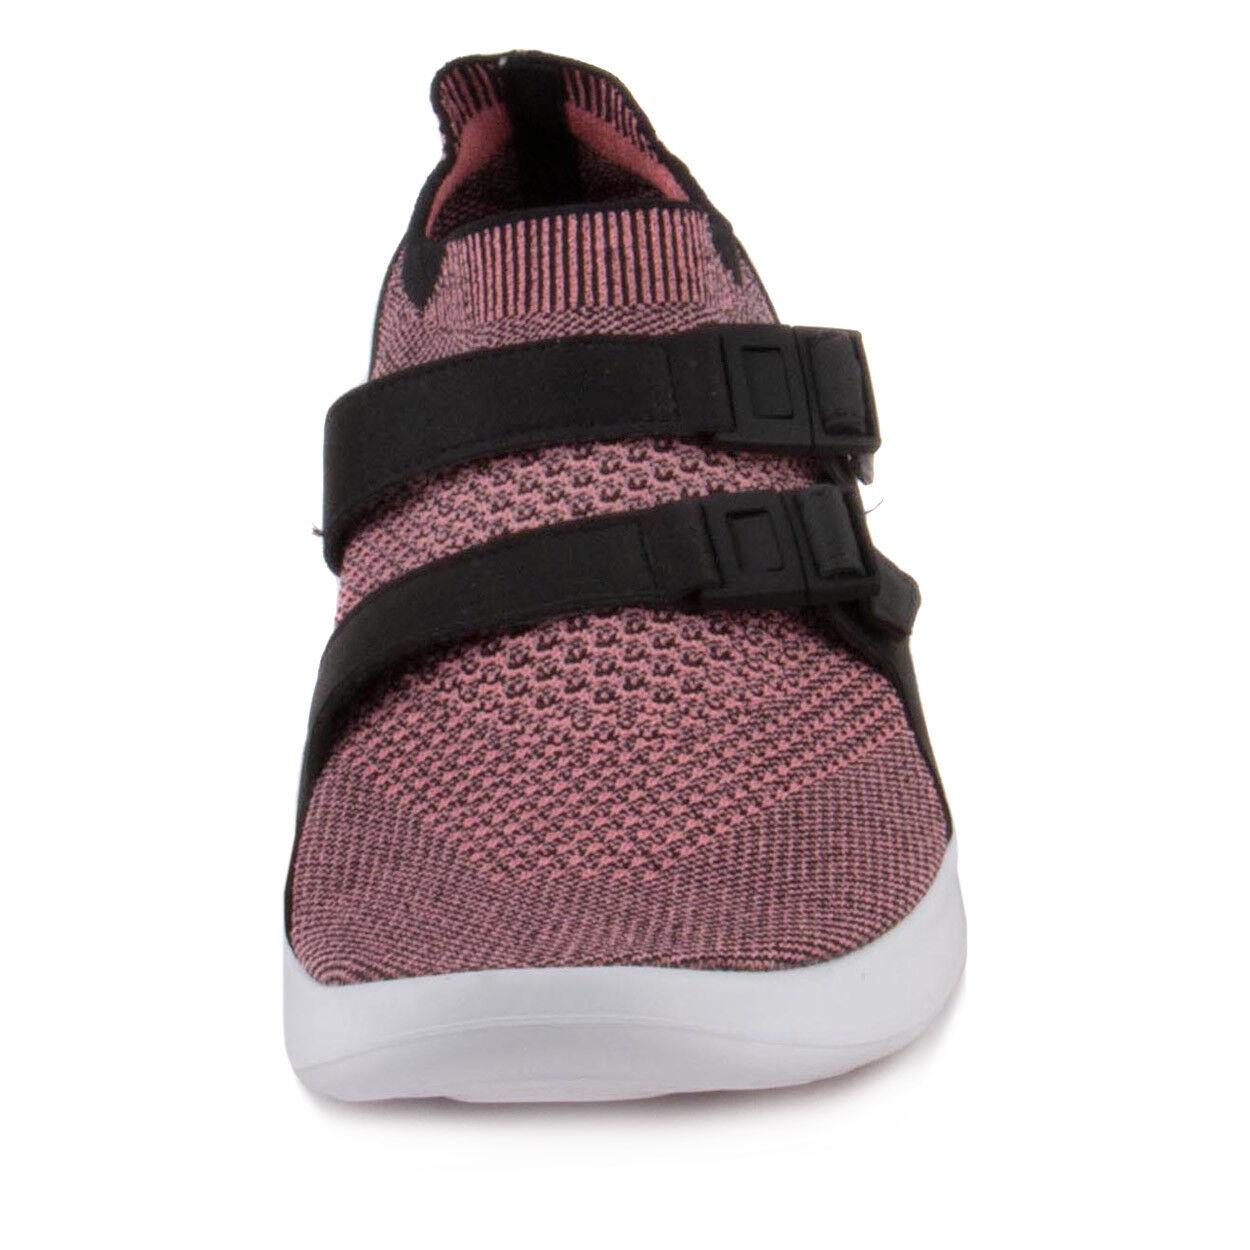 Nike Mens Air Sockracer Flyknit Black Melon Melon Melon 898022-003 16b254